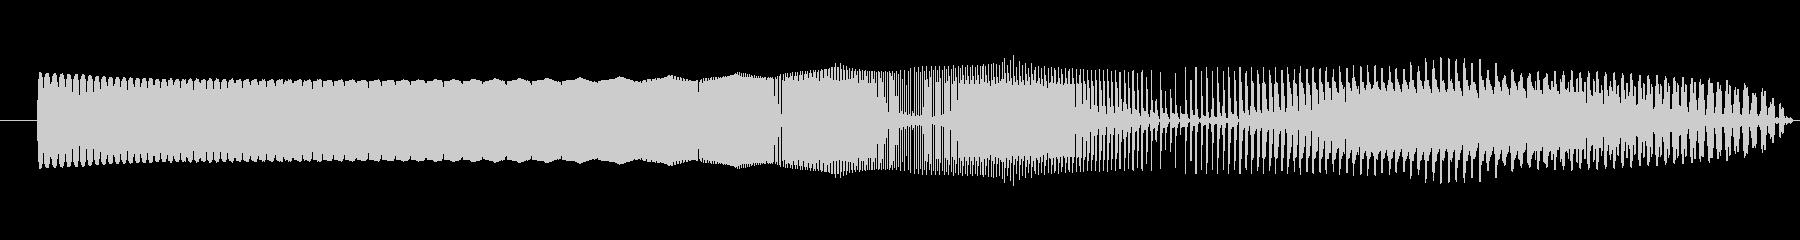 FX 電力損失01の未再生の波形